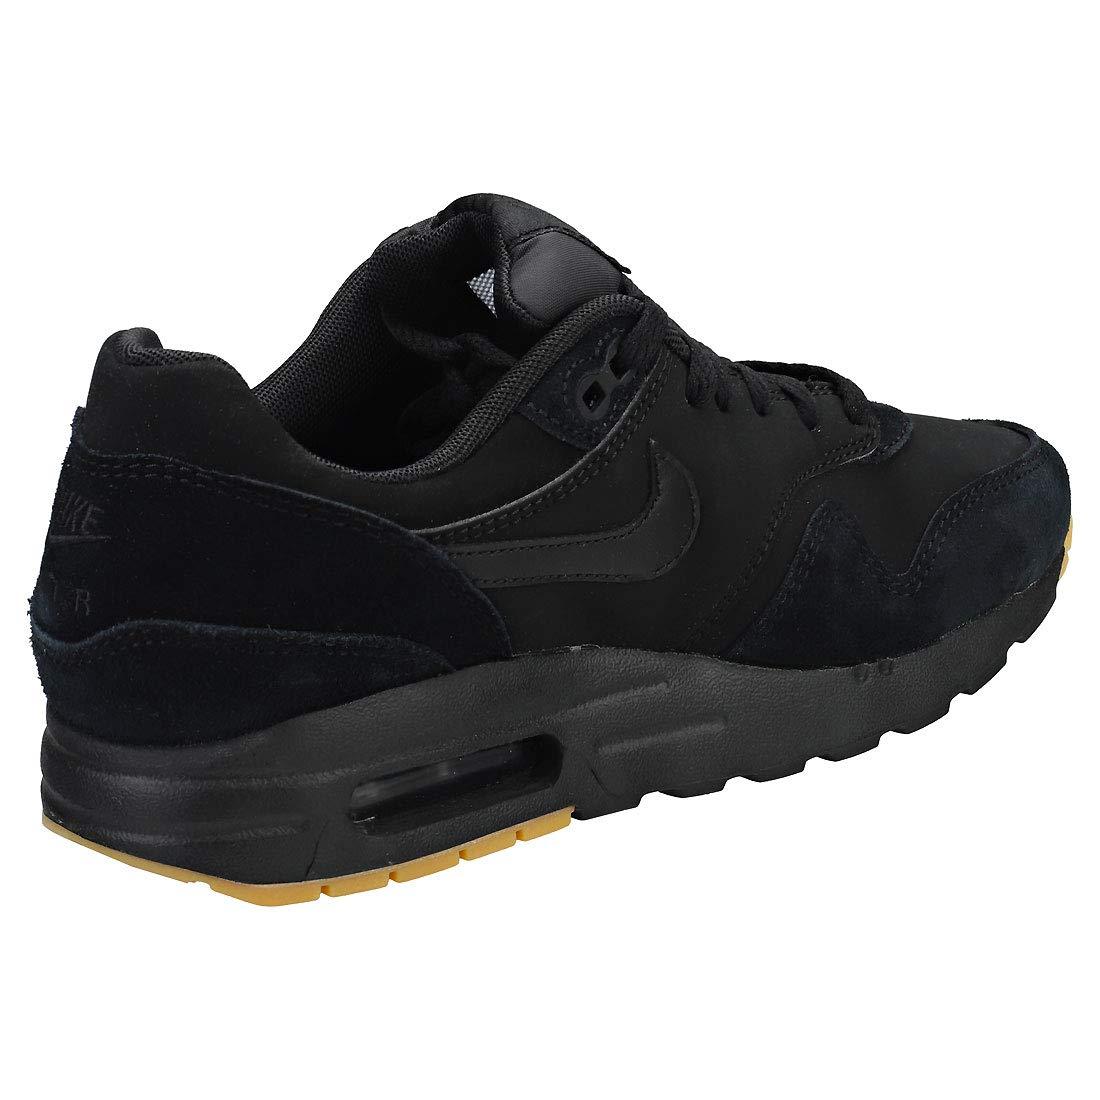 86ecd478447 NIKE Men's Air Max 1 (gs) Low-Top Sneakers, Multicolour Black/Gum Light  Brown 001, 6 UK: Amazon.co.uk: Shoes & Bags